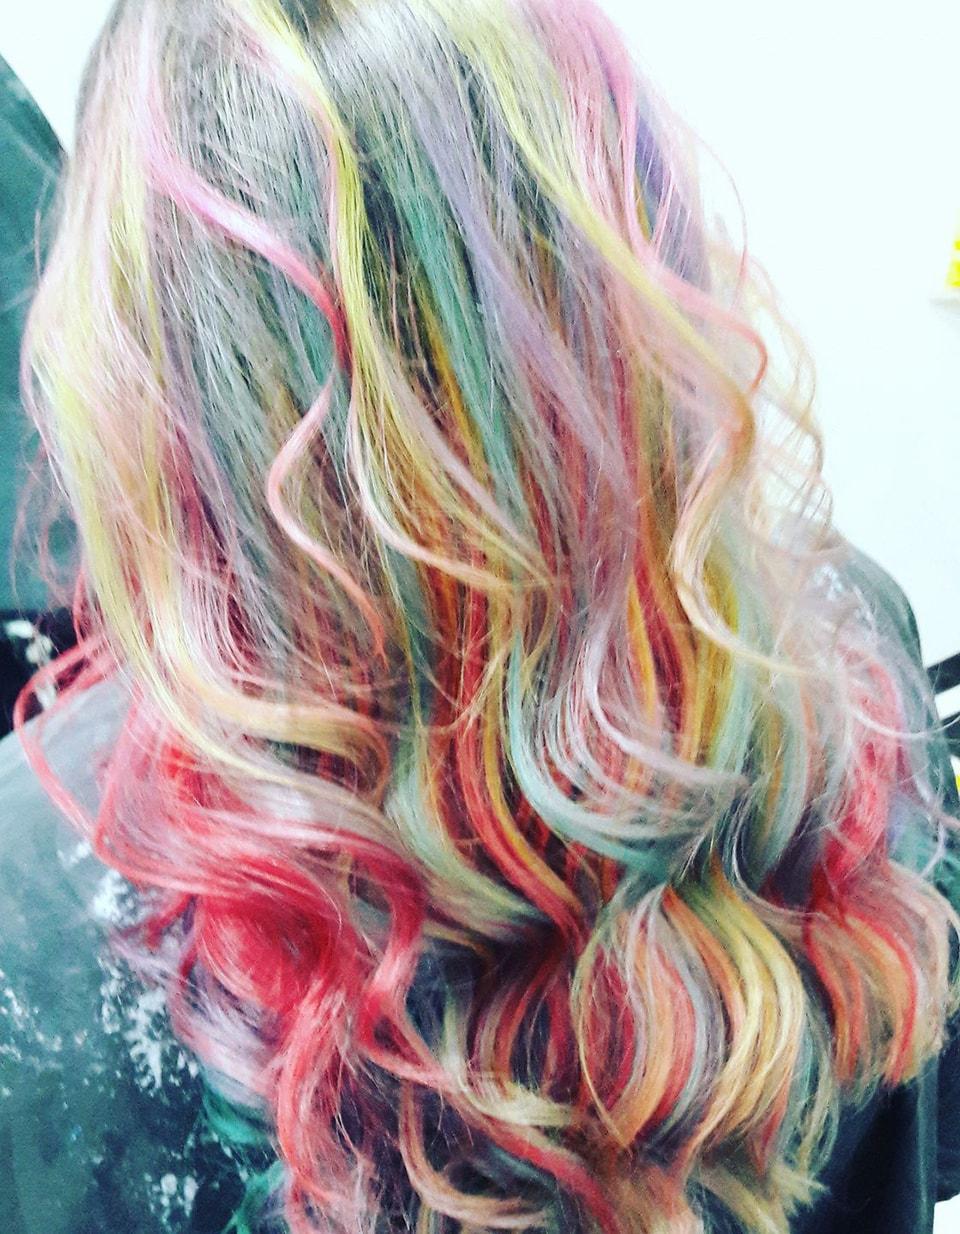 Frau Schneider Stylist Vienna - Haircut - Dyed Hair (13)